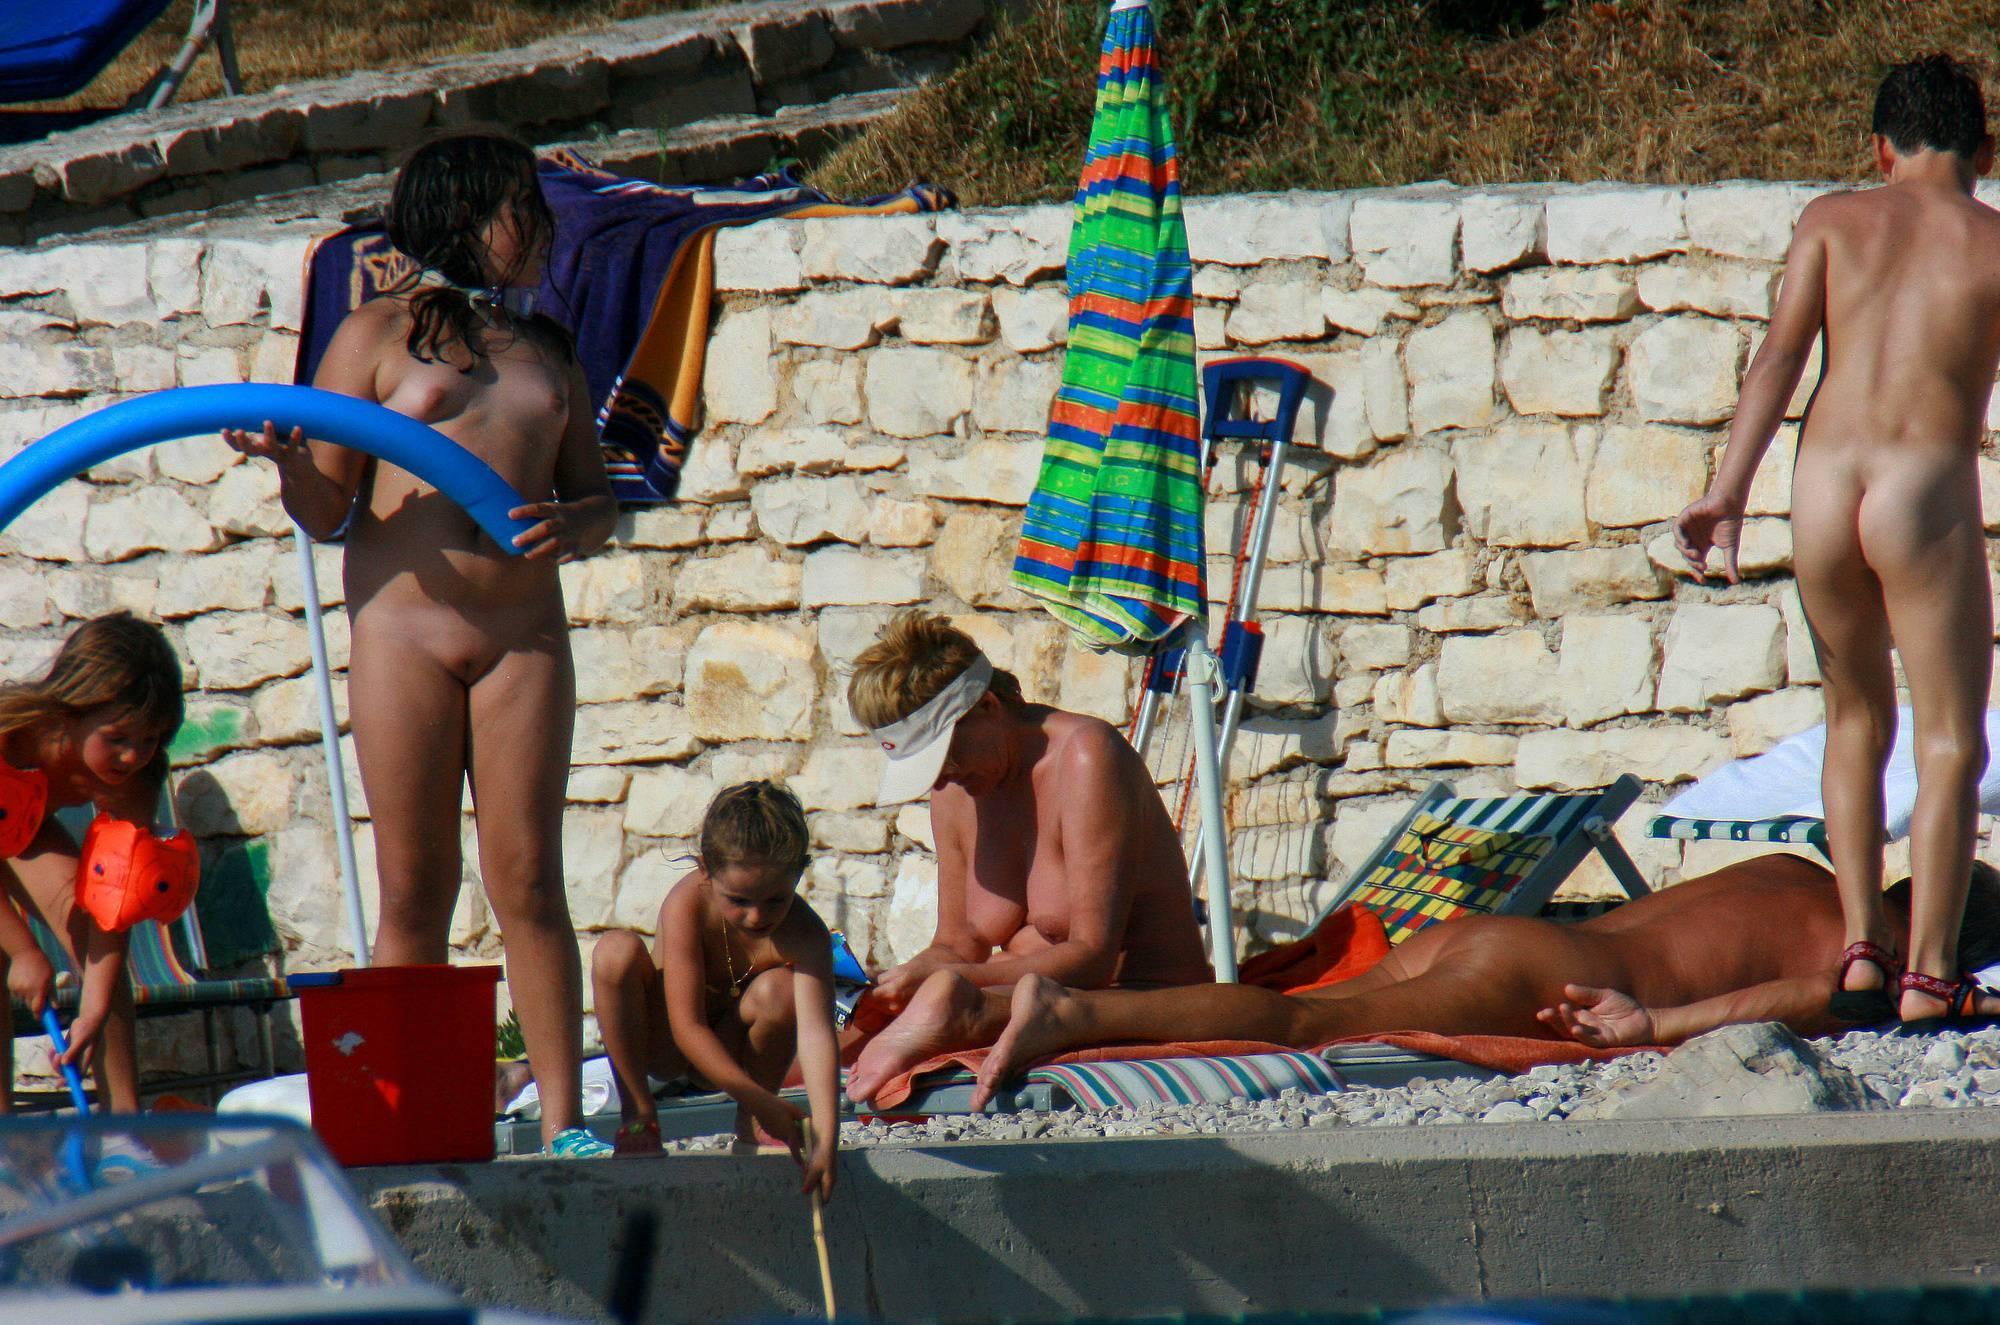 Nudist Pictures Ula FKK Shore Kid's Family - 2